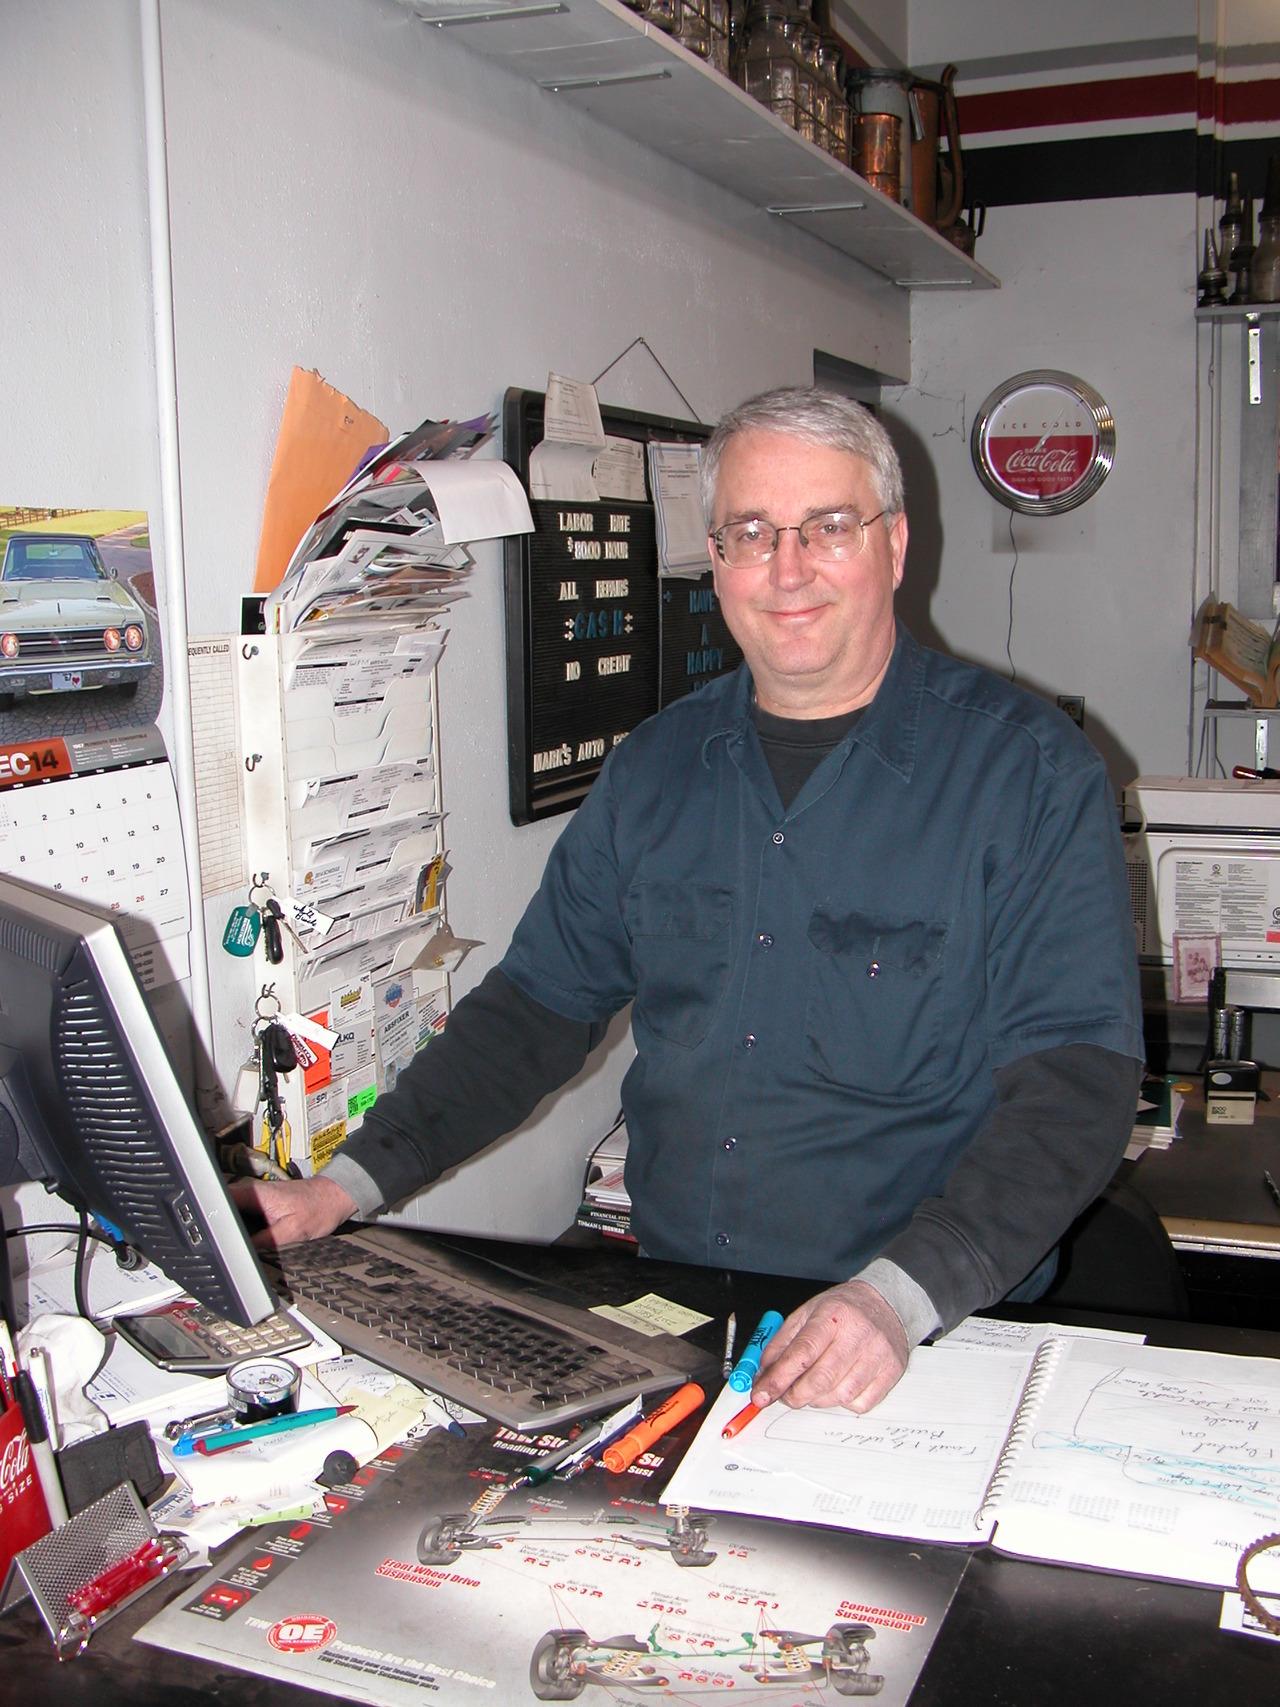 Top 10 Tools, Mark Maas: Mark's Auto Repair LLC